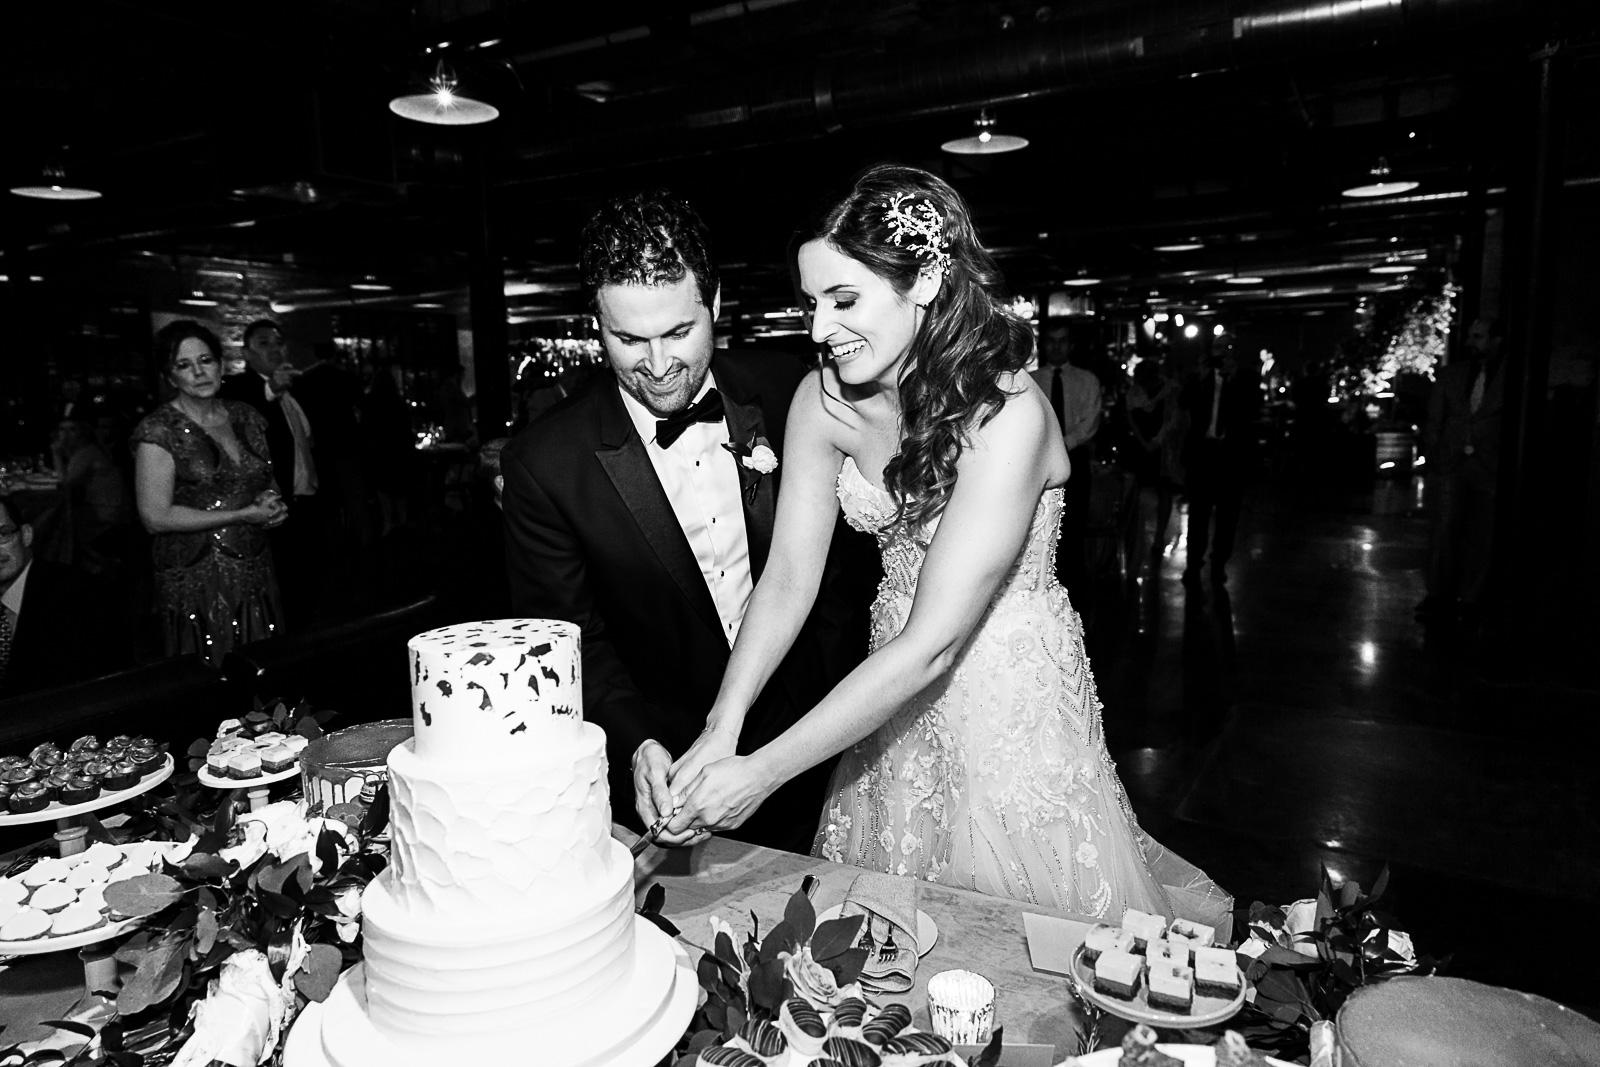 Bride and groom cut their custom wedding cake in Chicago.